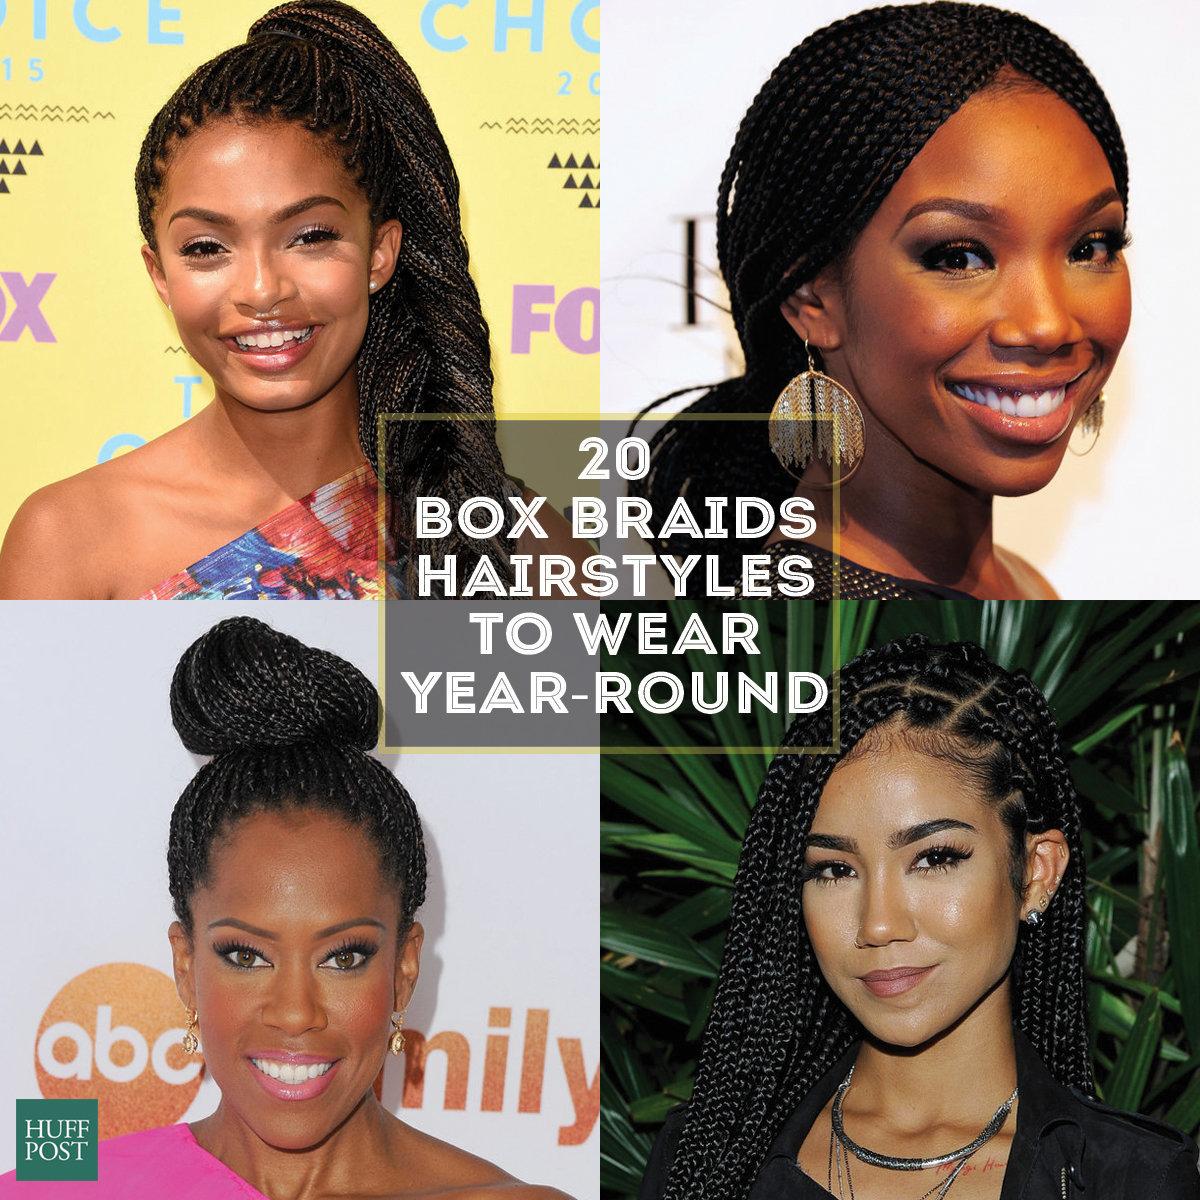 20 Badass Box Braids Hairstyles That You Can Wear Year,Round